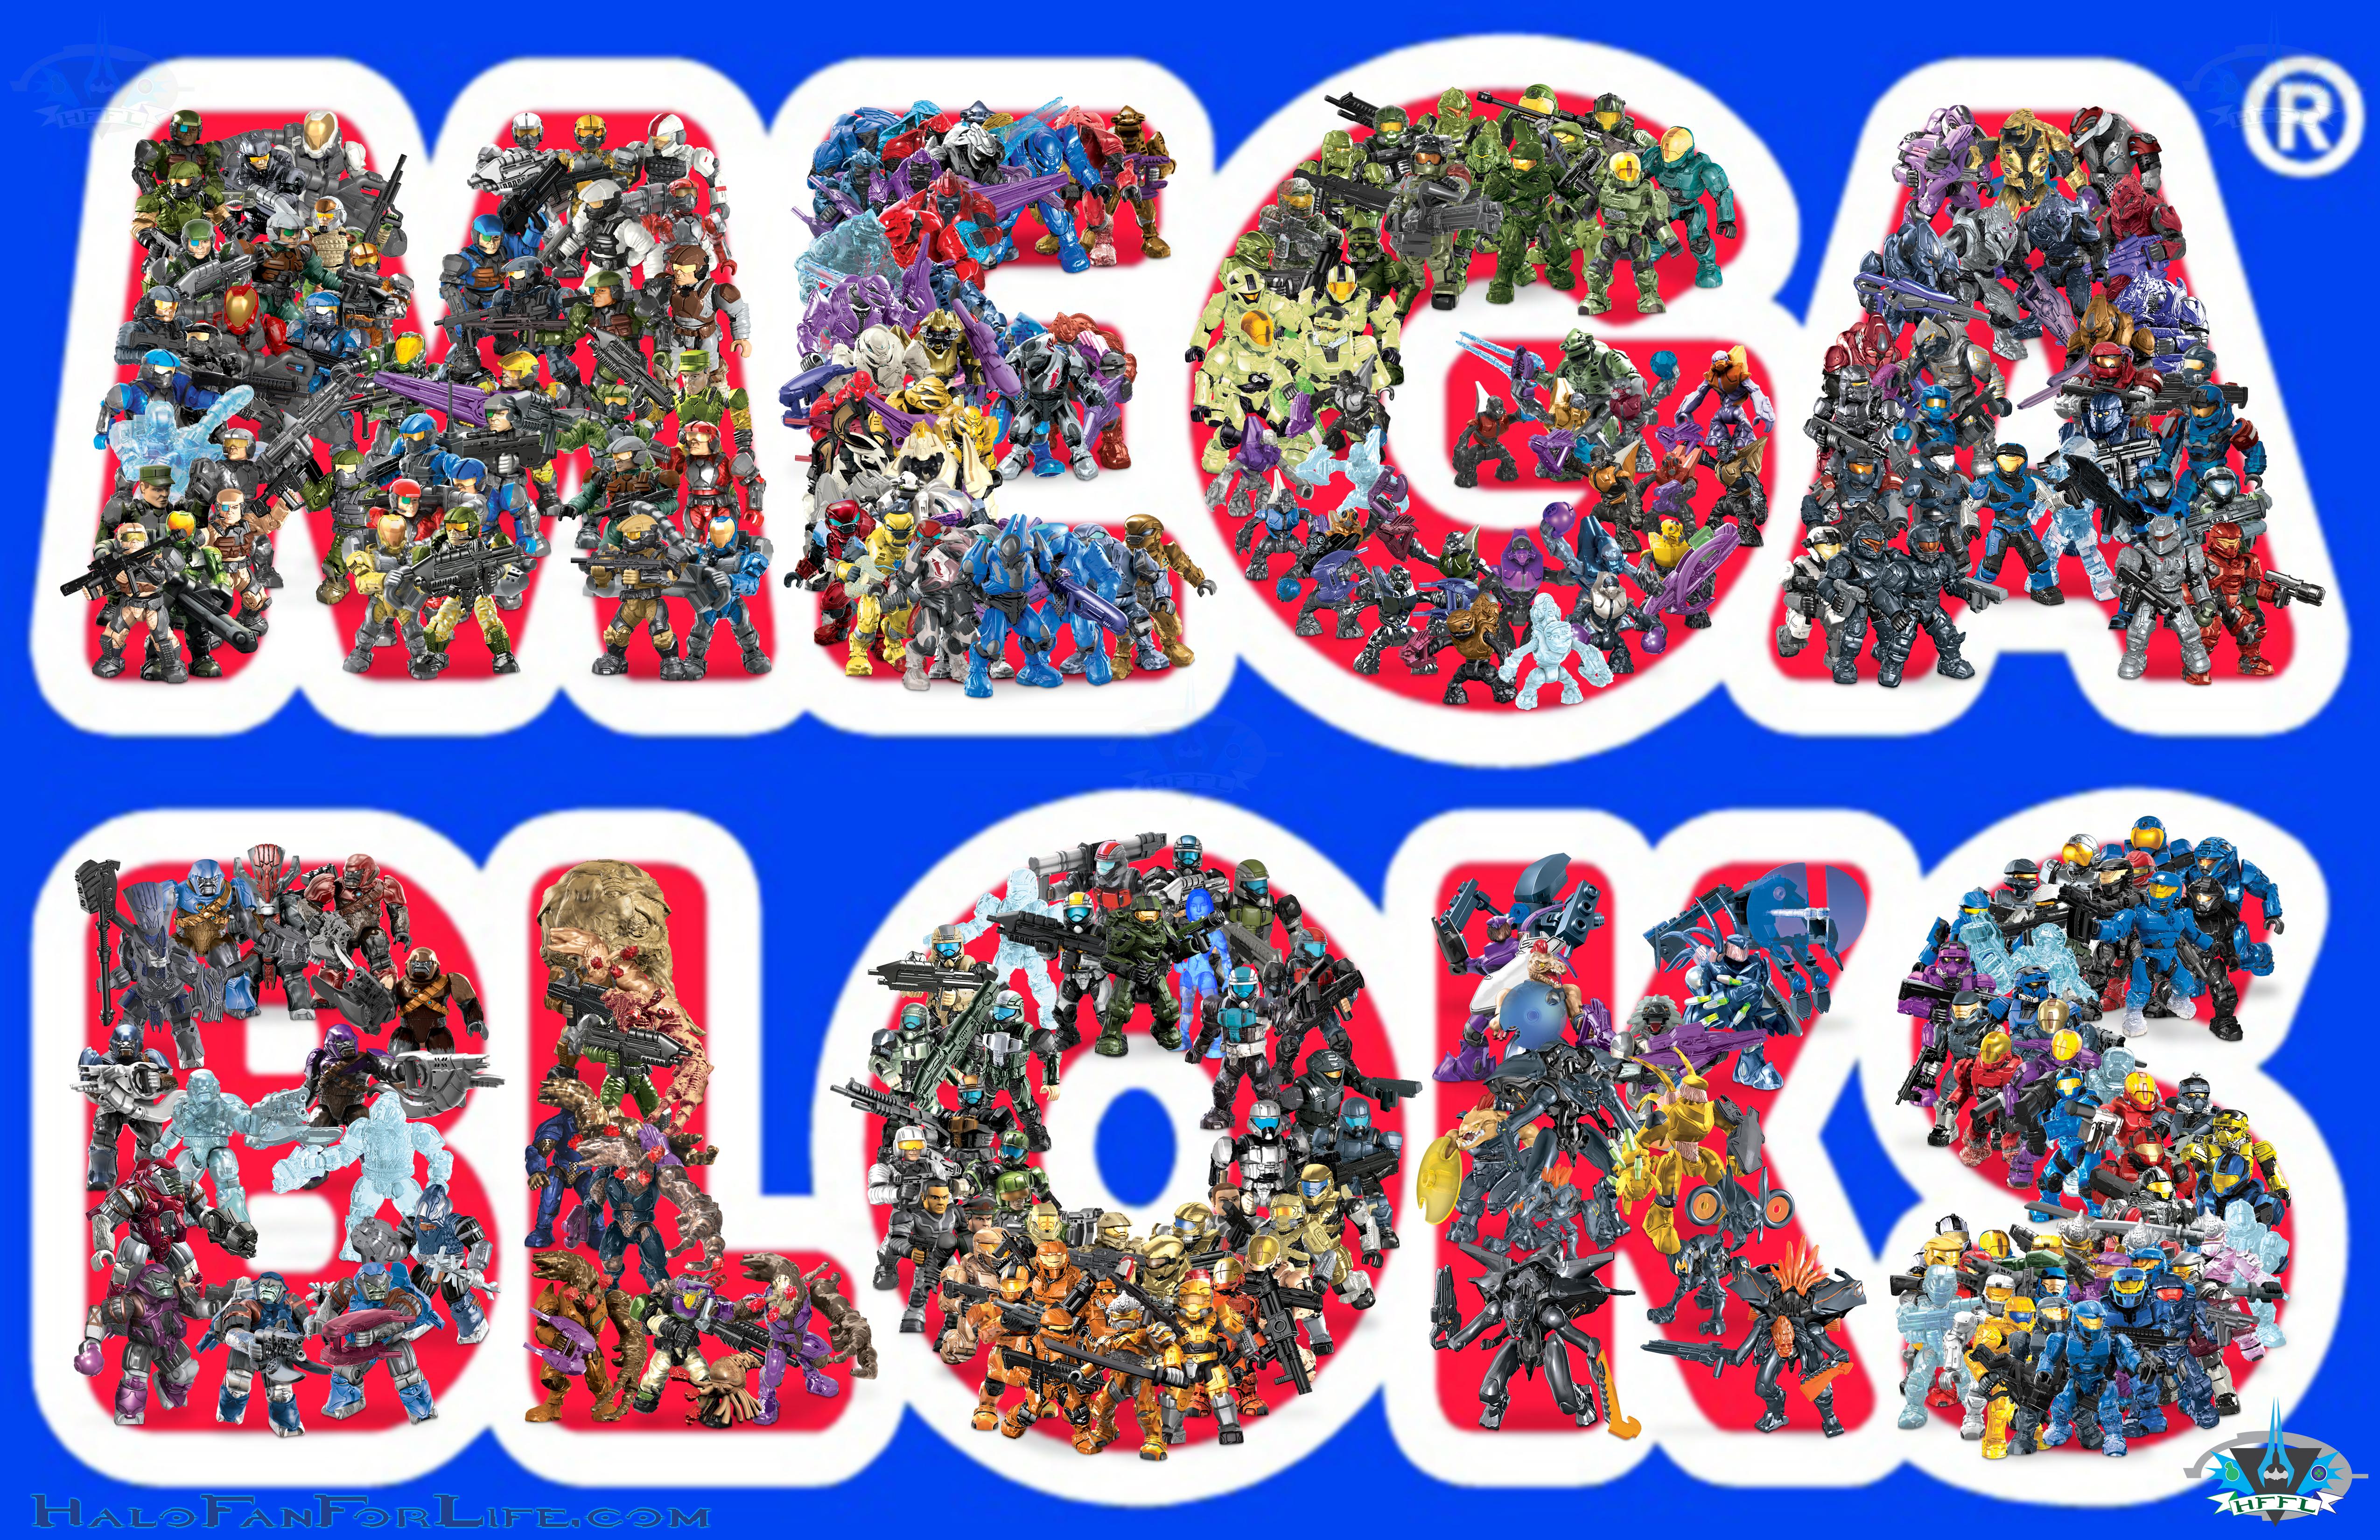 Amazing Wallpaper Logo Collage - Mega-Bloks-logo-COLLAGE-of-minifigs-wMBlogo  Photograph_624334.jpg